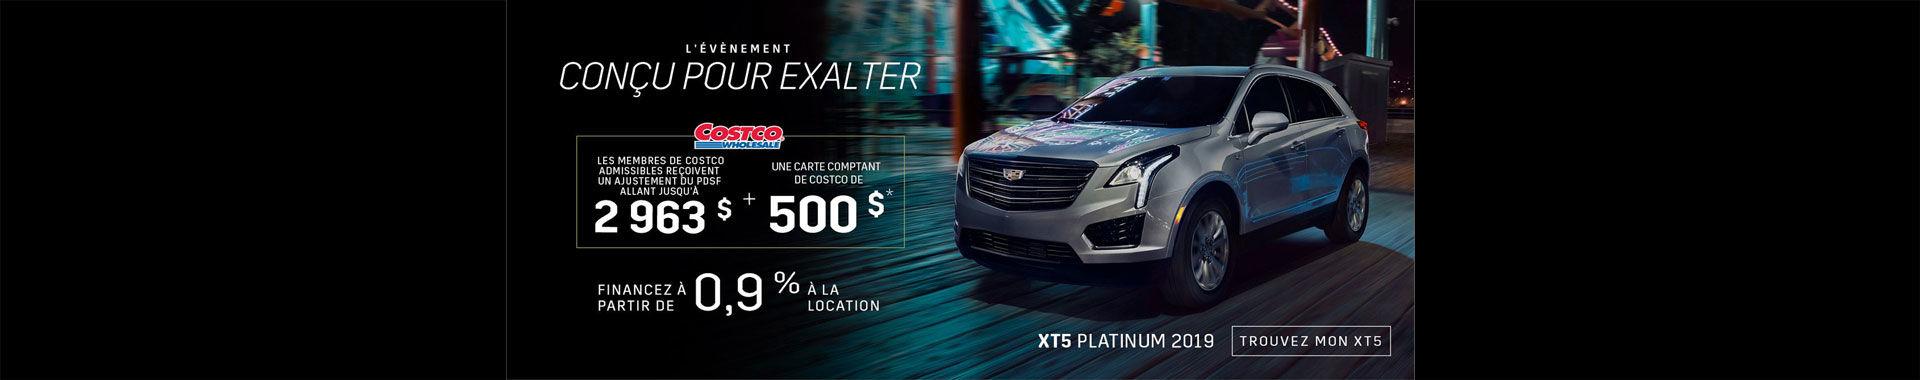 Cadillac XT5 - Aout 2019